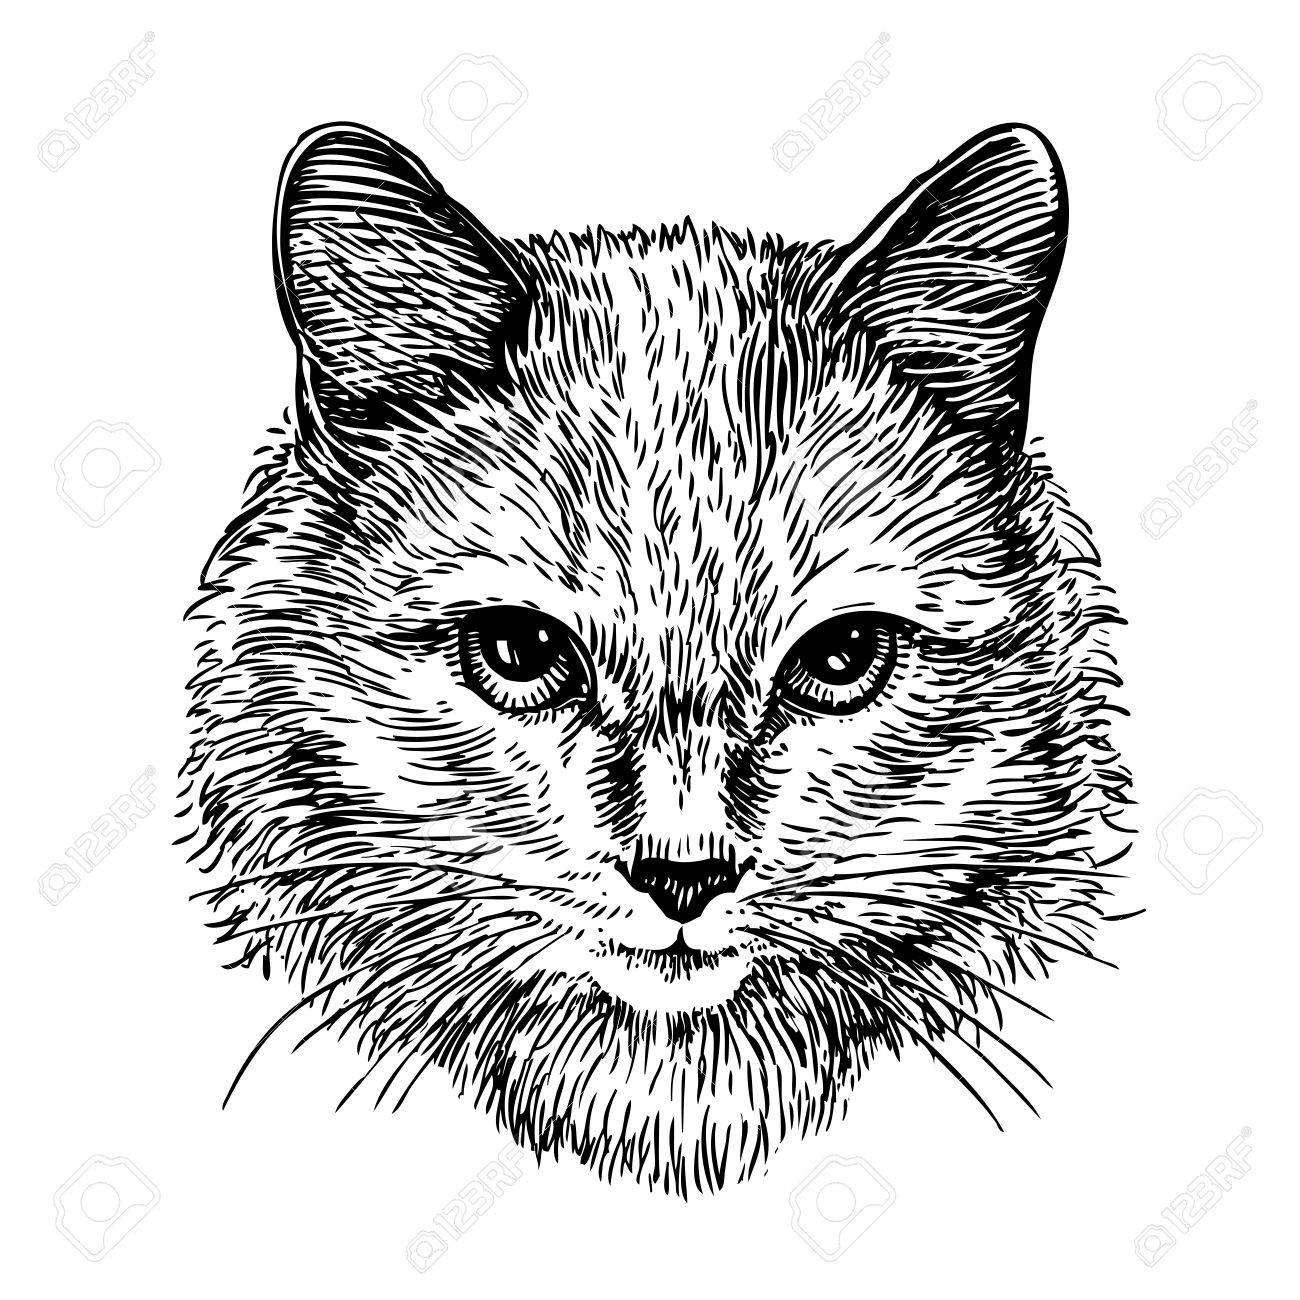 1300x1300 Hand Drawn Portrait Of Cute Cat, Sketch. Art Vector Illustration